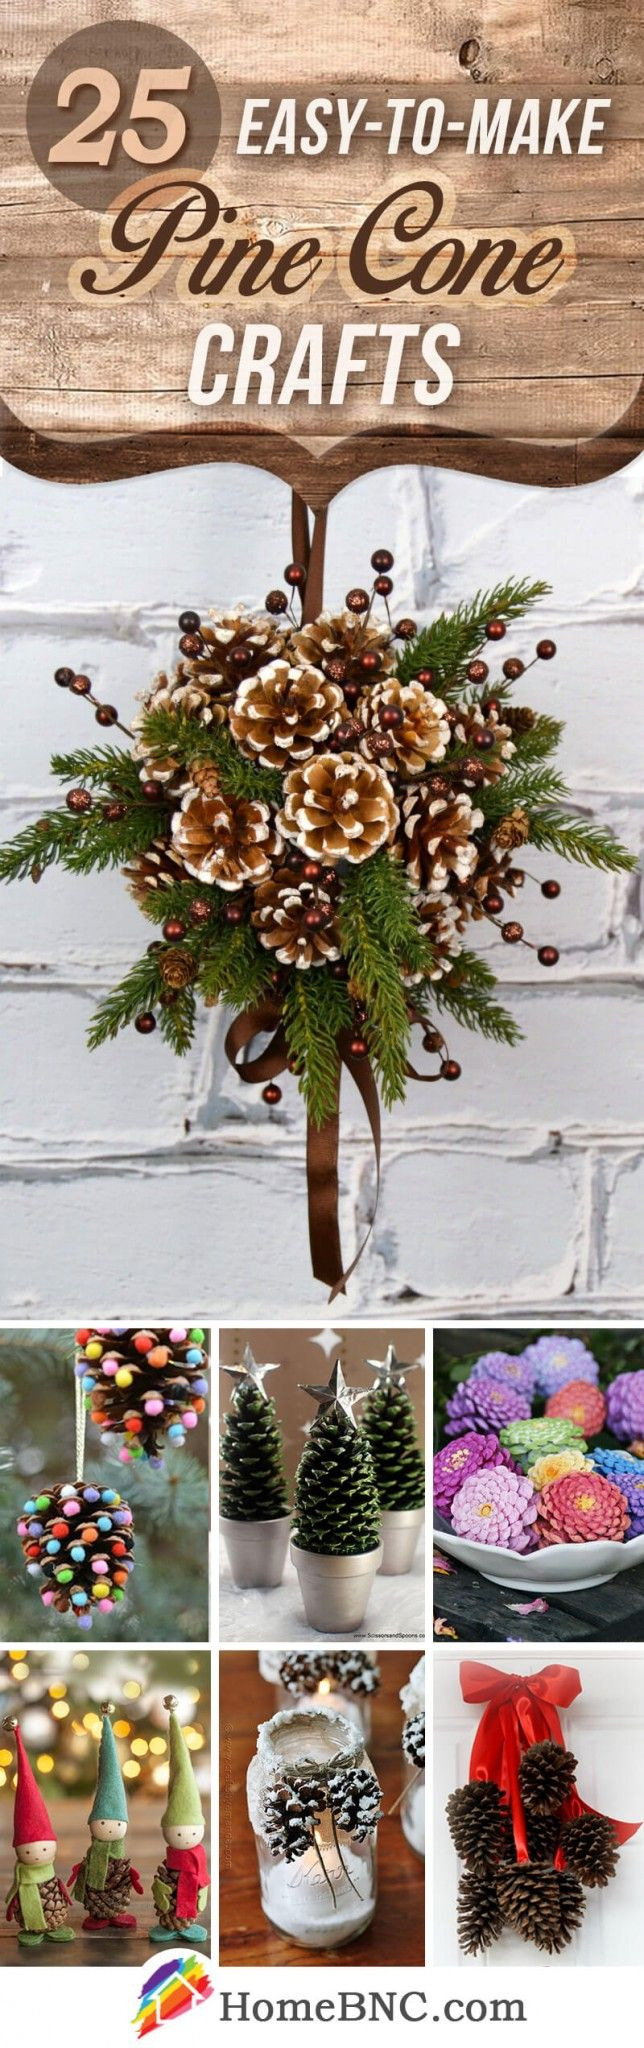 Diy Pine Cone Craft Ideas Pine Cone Crafts Pinterest Pine Cone